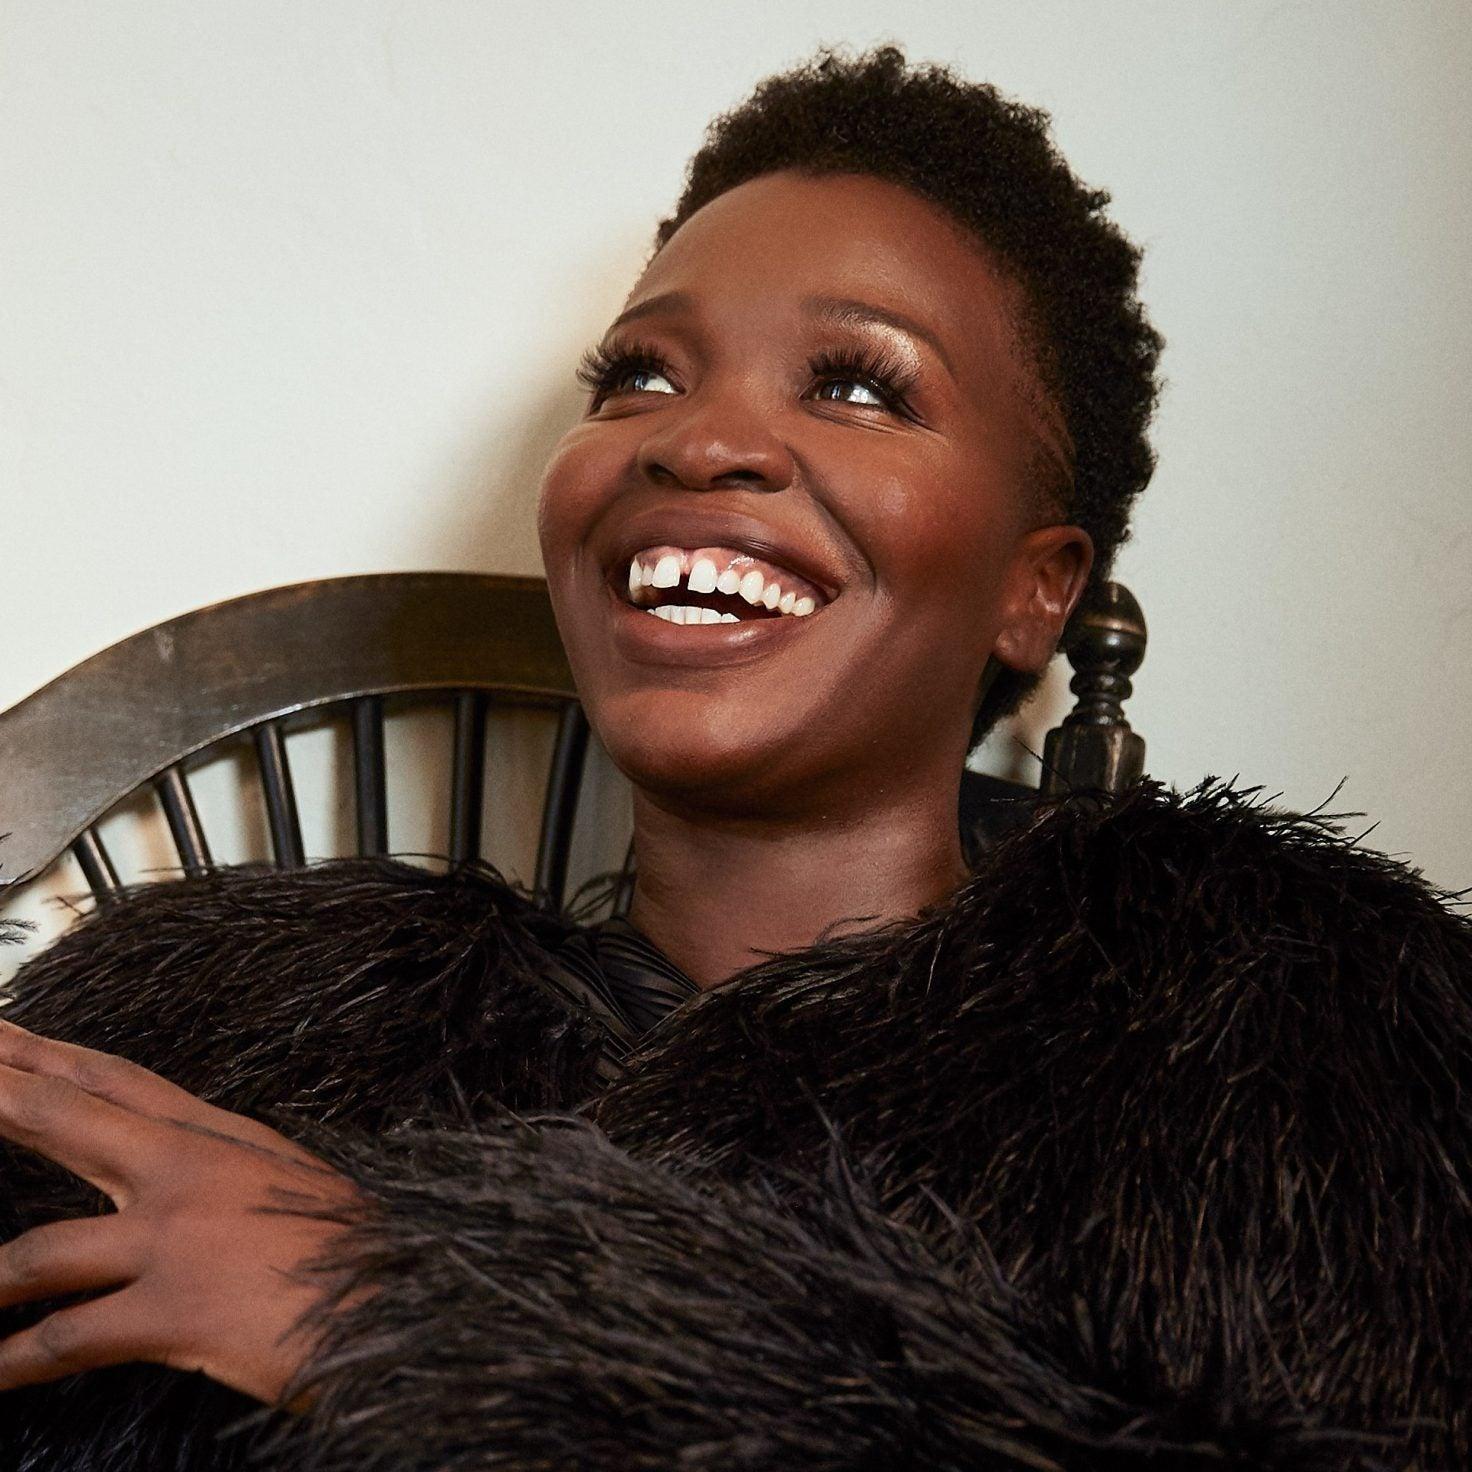 Meet Folake Olowofoyeku: Star of America's First Sitcom Featuring a Nigerian Family